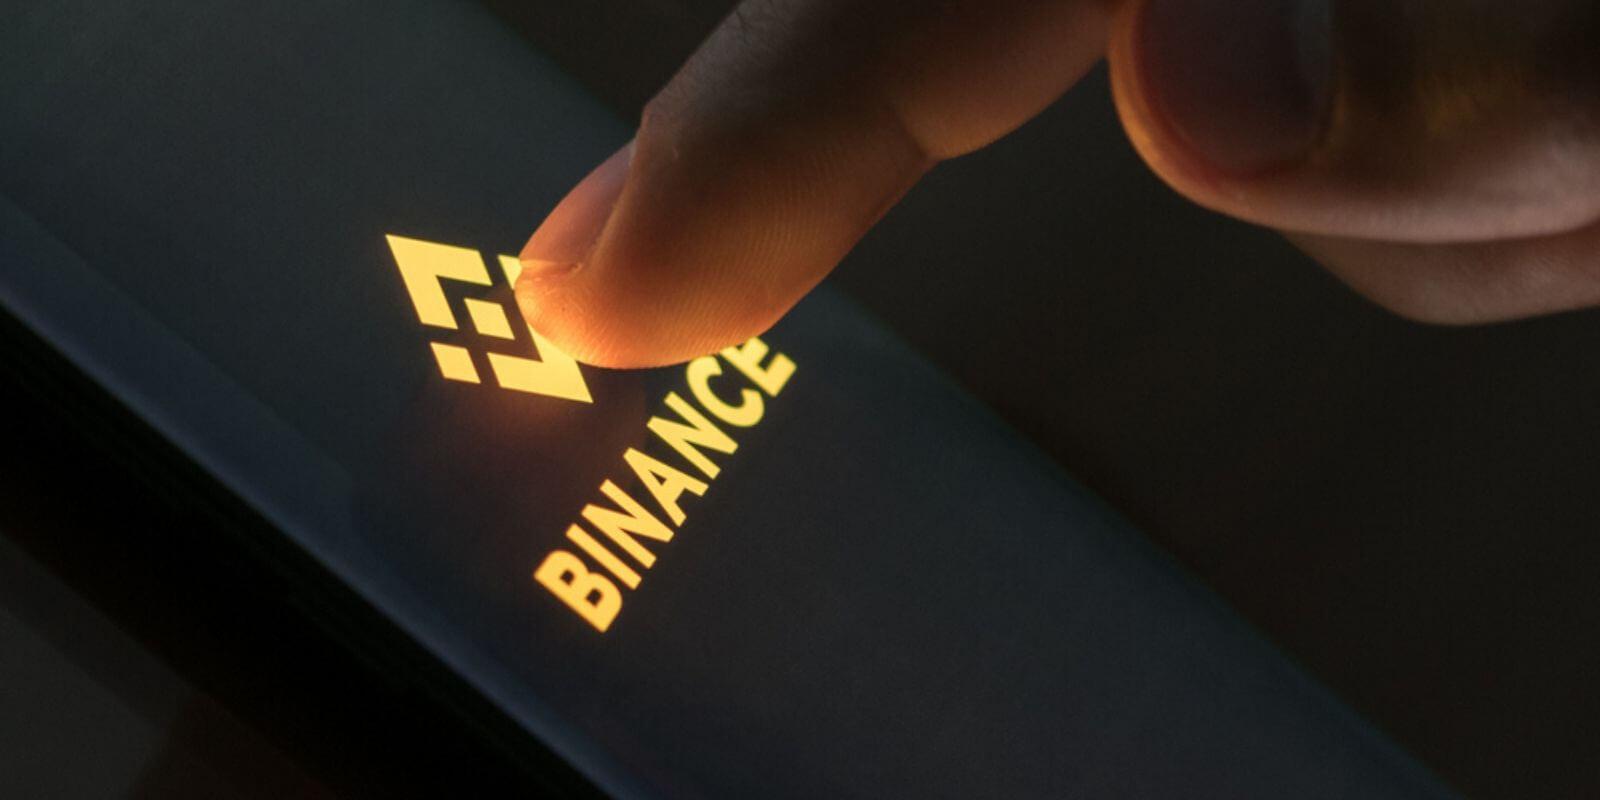 acheter des cryptomonnaies sur Binance